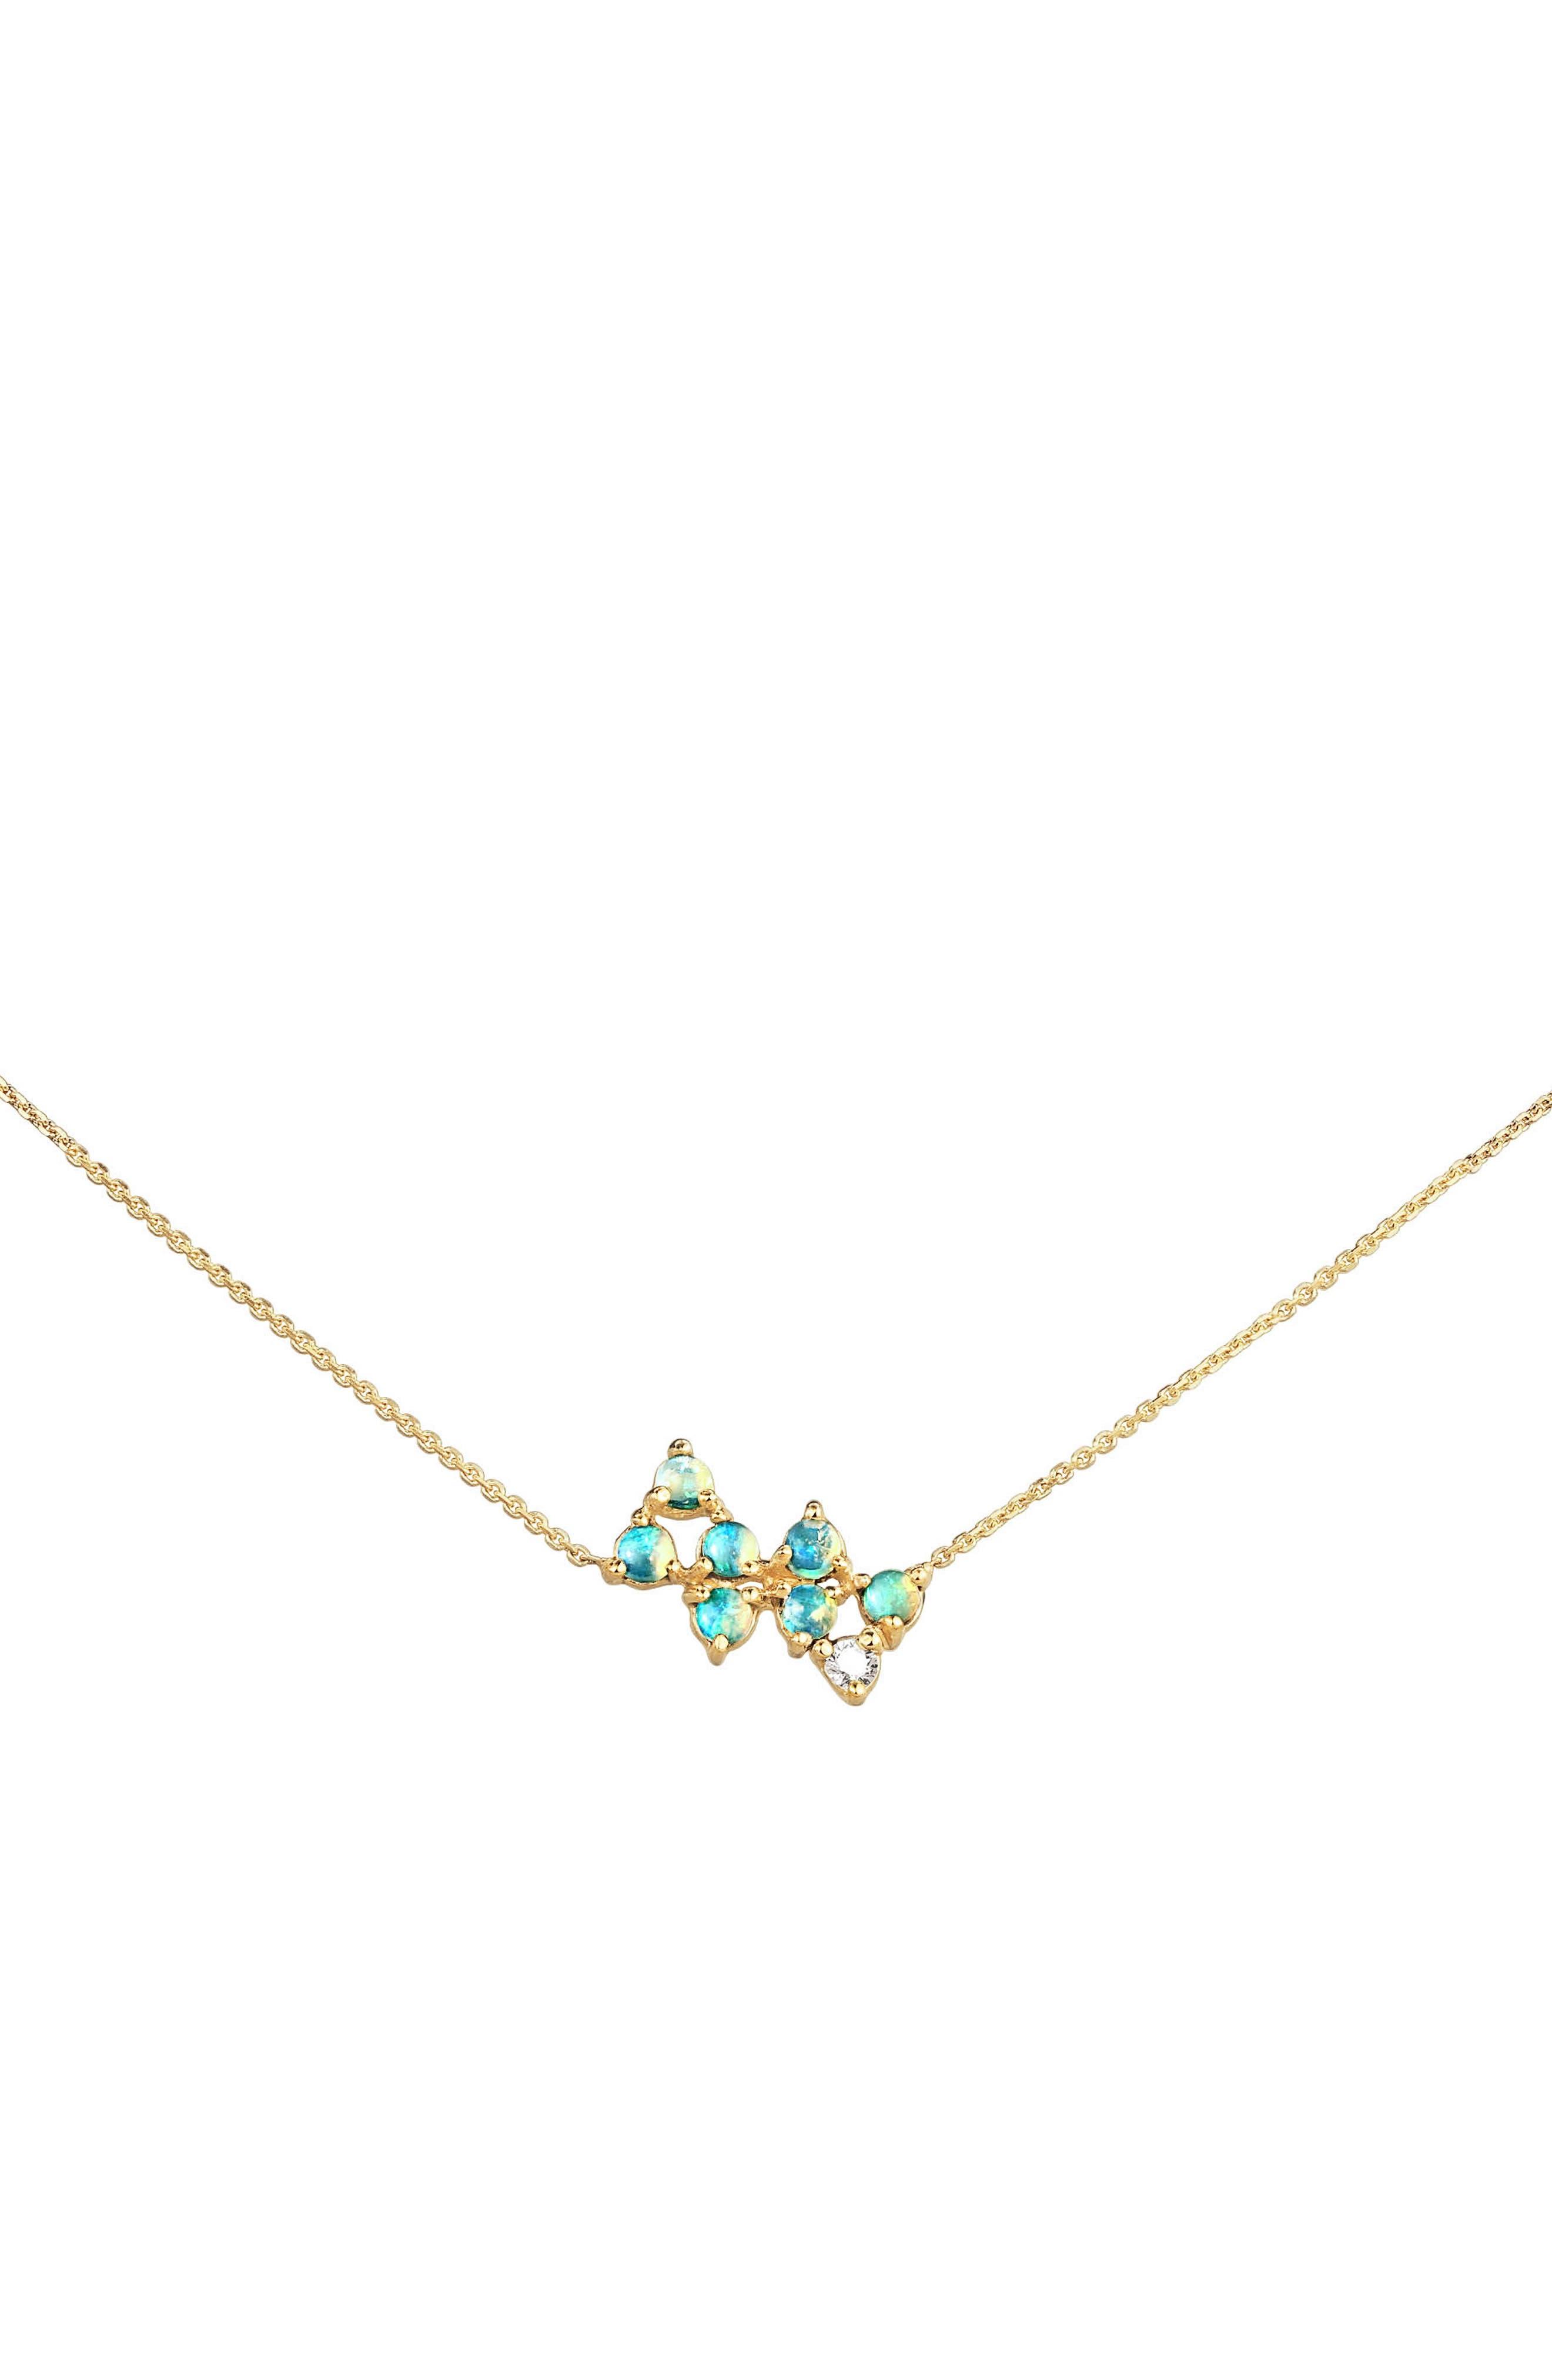 Opal & Diamond Bias Necklace,                             Main thumbnail 1, color,                             OPAL AND WHITE DIAMOND